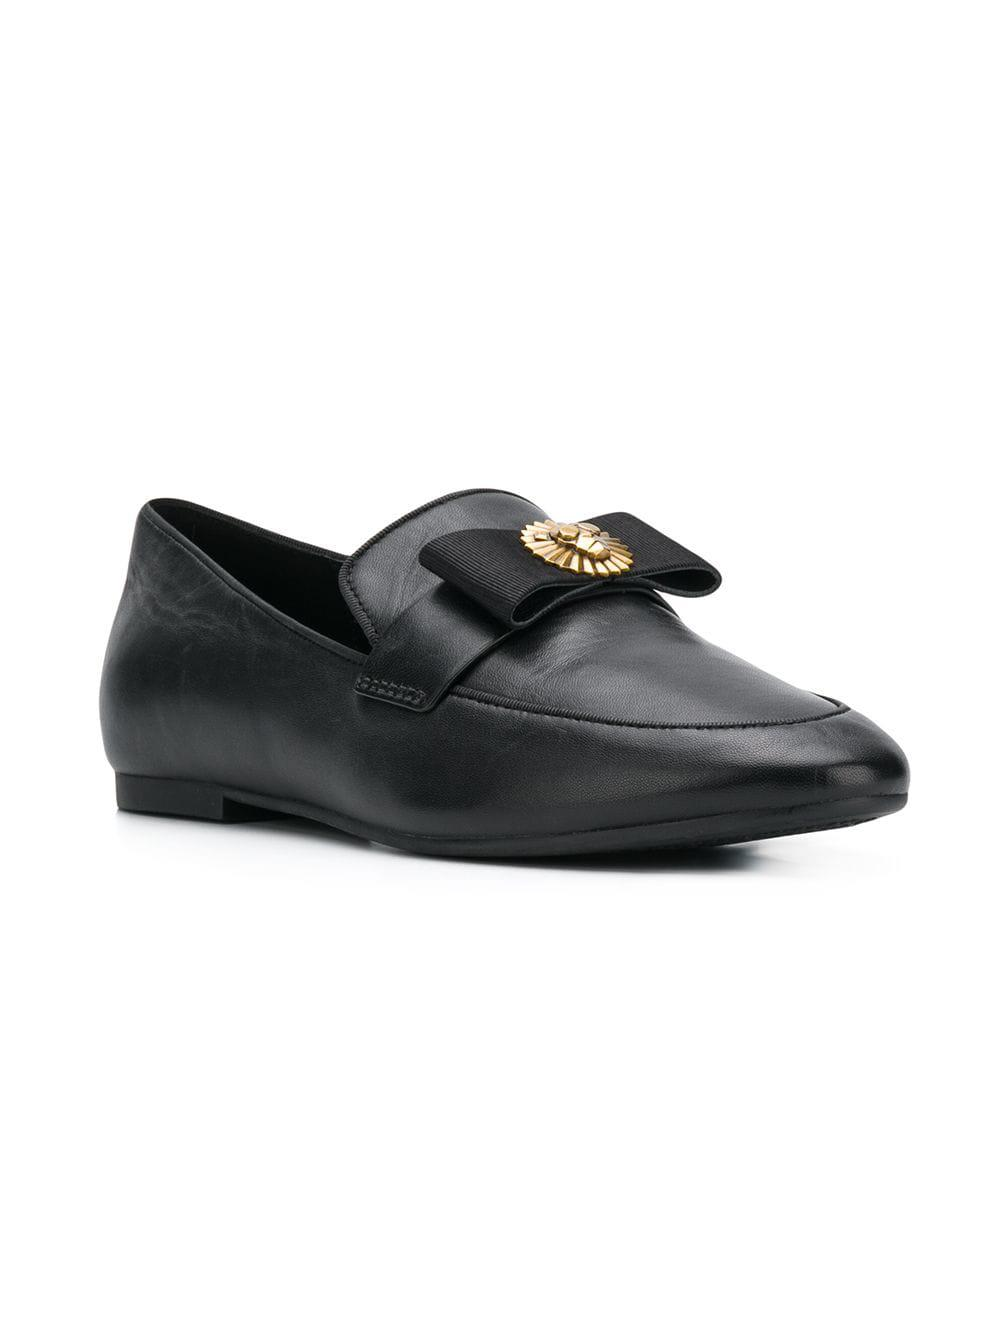 9bd4f461e58 MICHAEL Michael Kors - Black Flat Bow Loafers - Lyst. View fullscreen